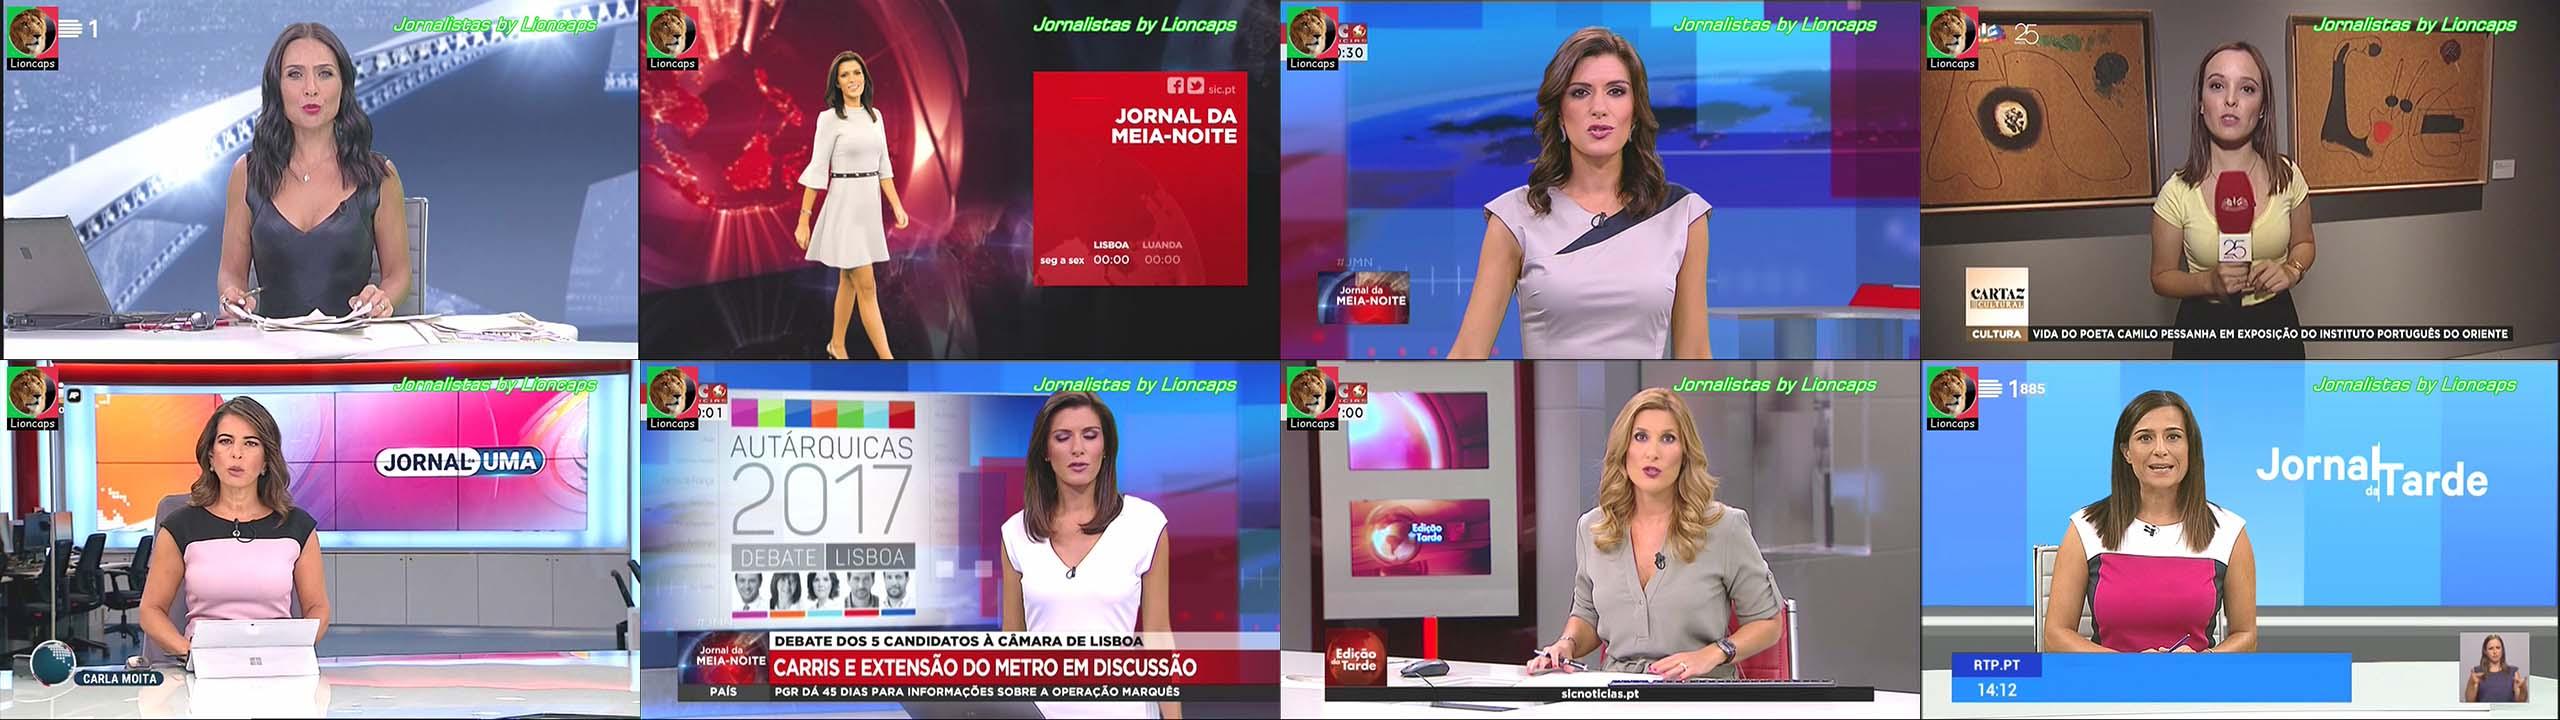 341005858_jornalistas_1080_lioncaps_23_09_2017_11_122_549lo.jpg